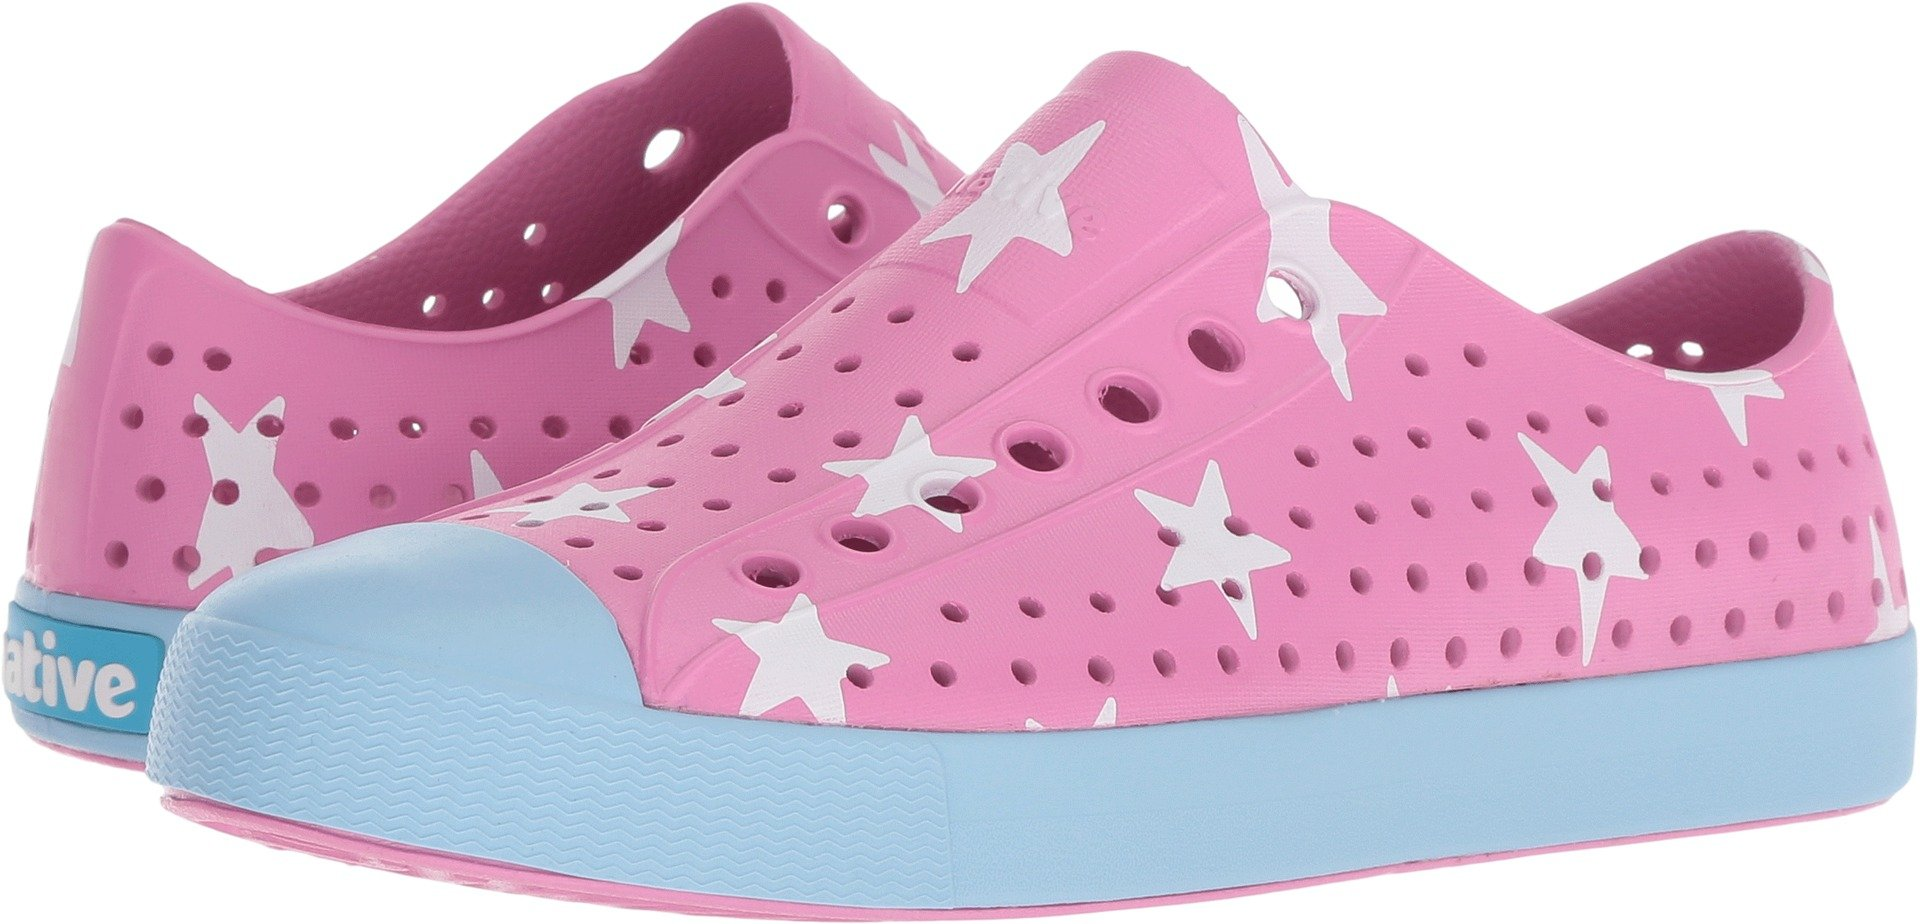 Native Shoes Jefferson Water Shoe Malibu Pink/Sky Blue/Big Star 10 Men's M US by Native Shoes (Image #1)